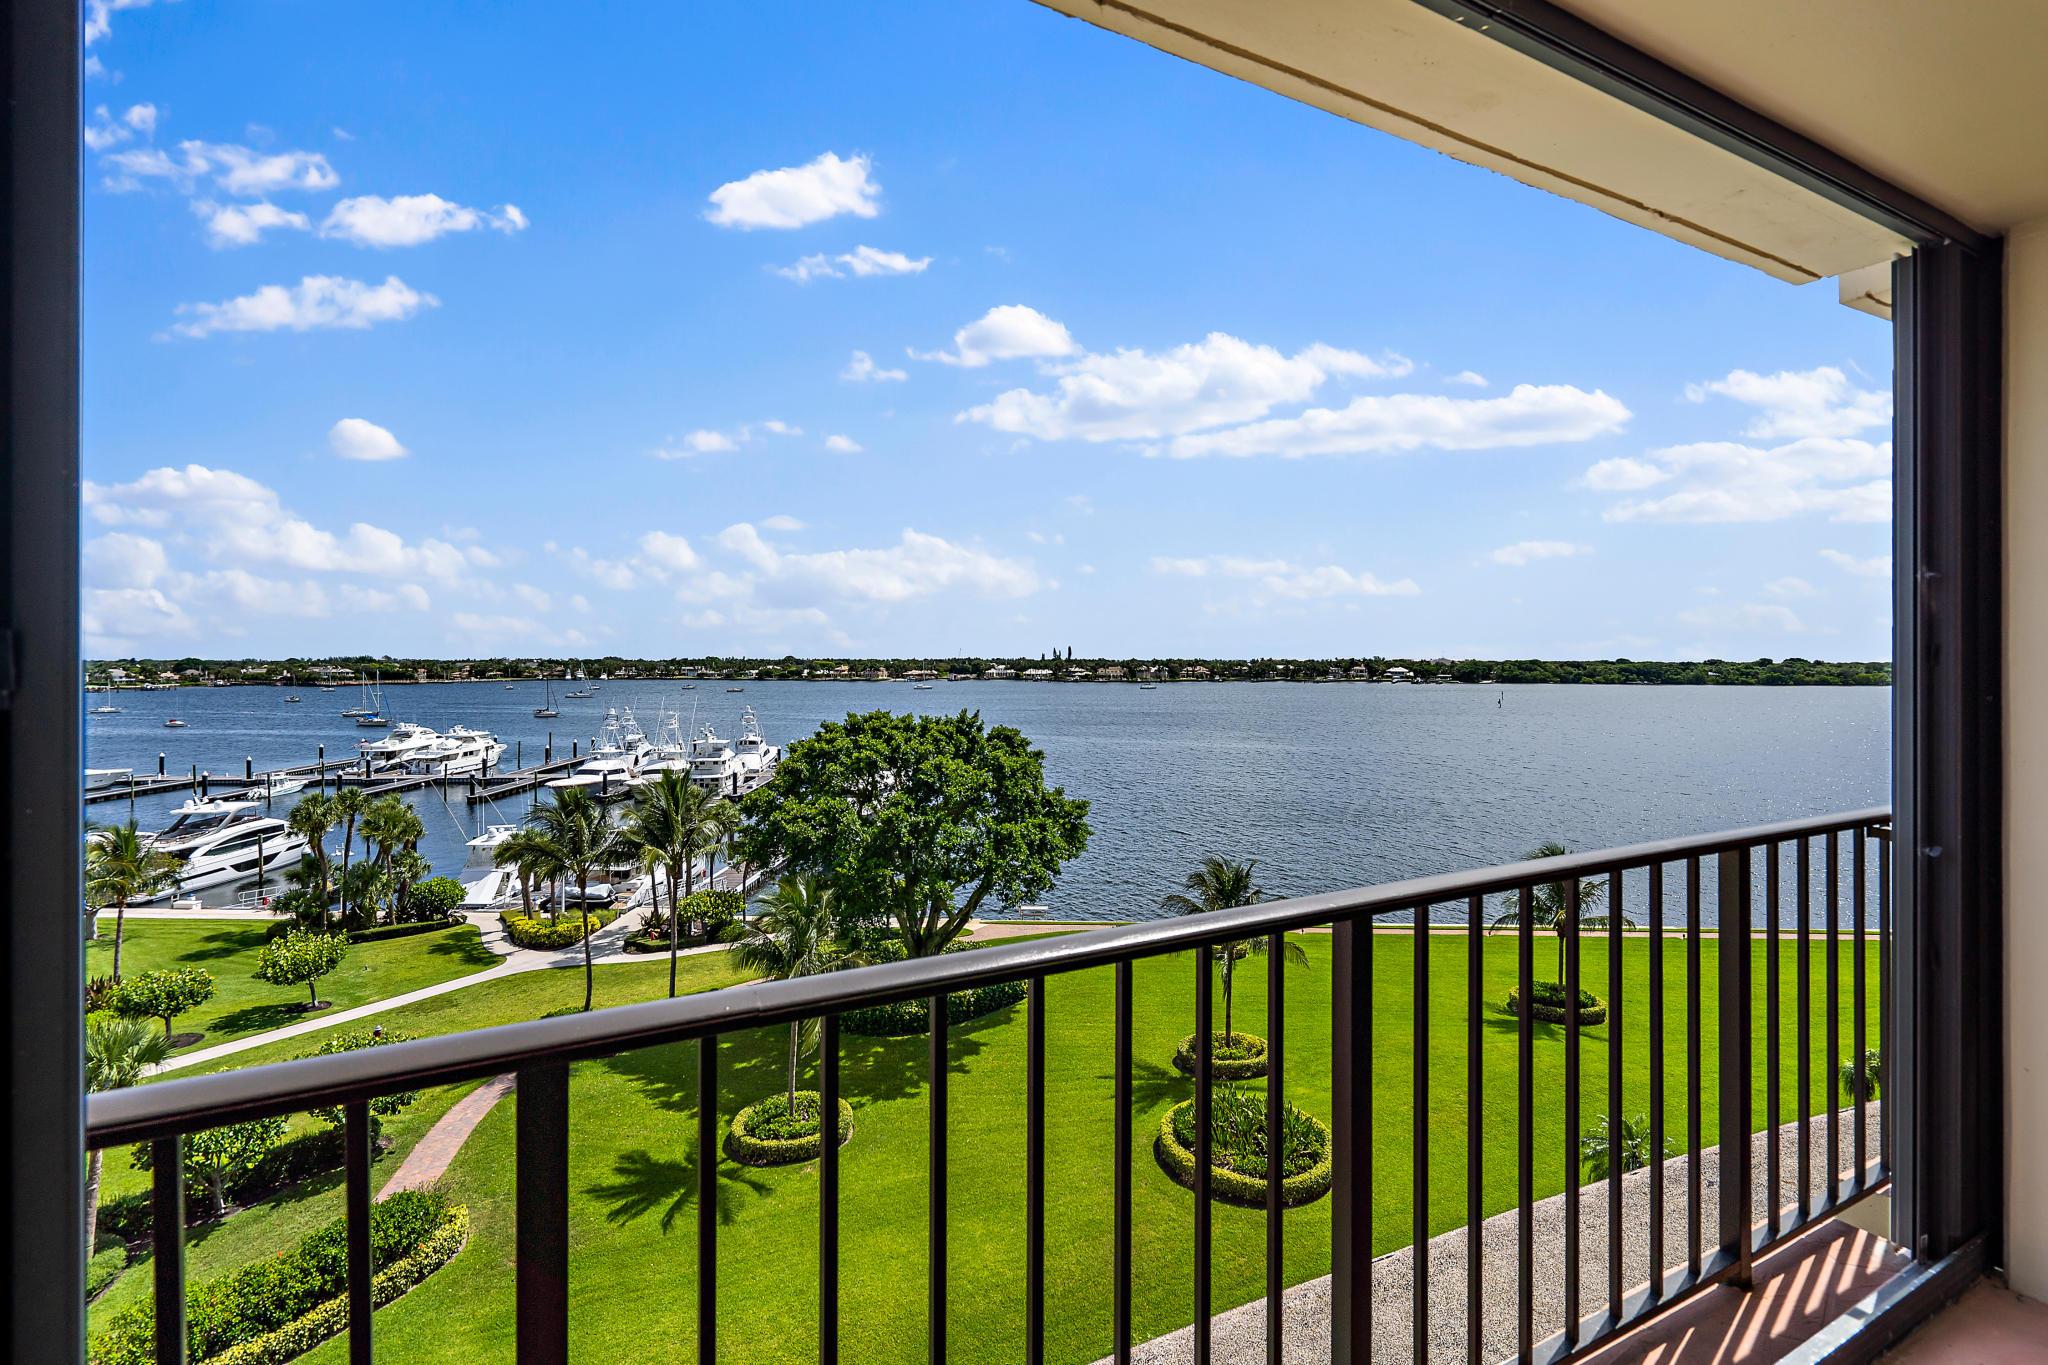 134  Lakeshore Drive 713 For Sale 10647024, FL